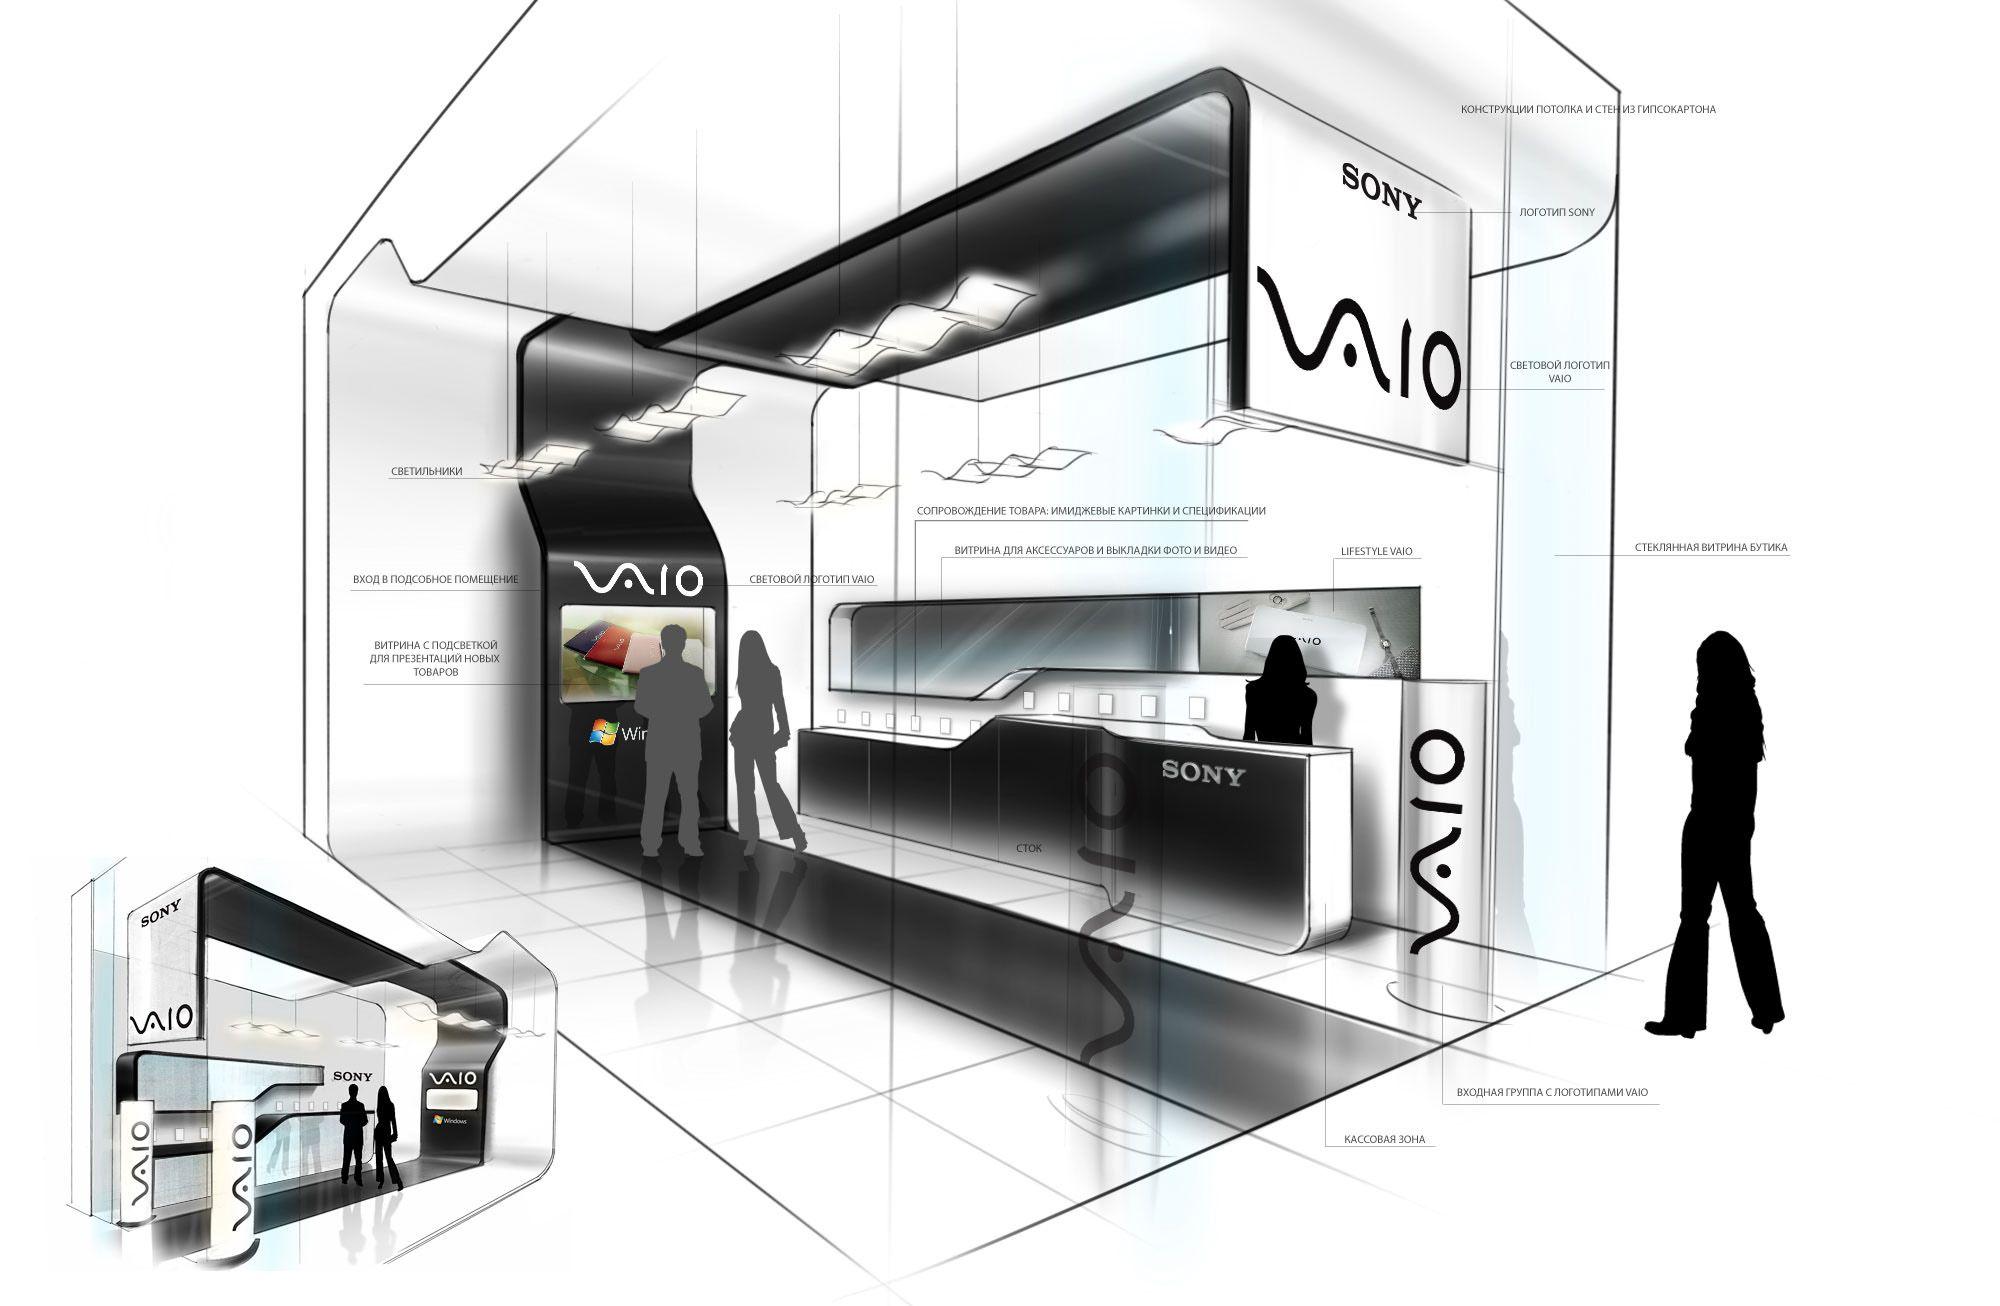 P.O.S.M. | Shop-in-shop by Stanislav Tsybulsky at Coroflot.com